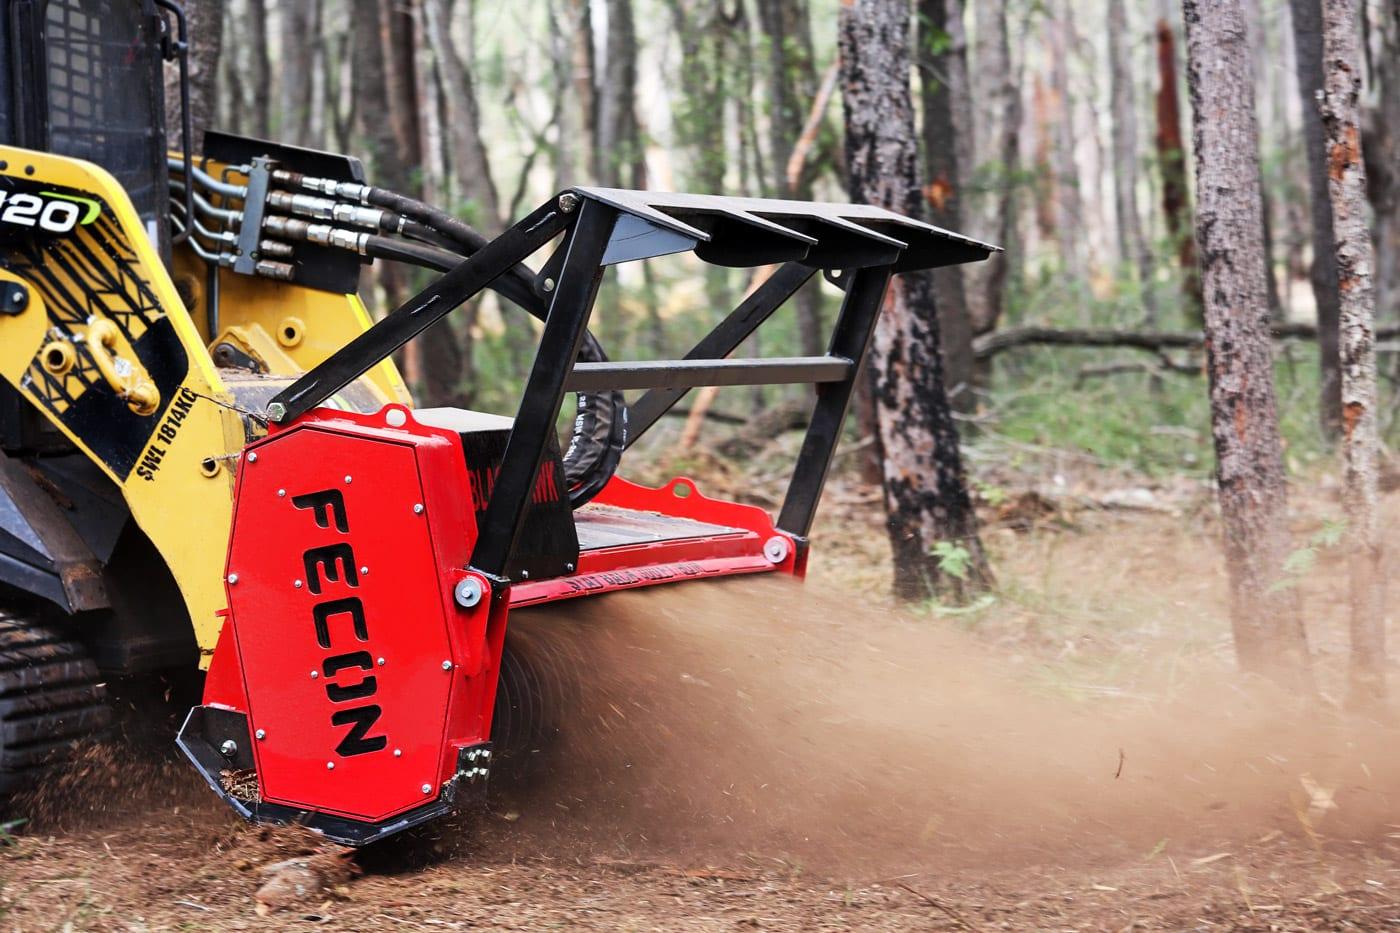 Fecon-Blackhawk-Skid-Steer-Forestry-Mulcher